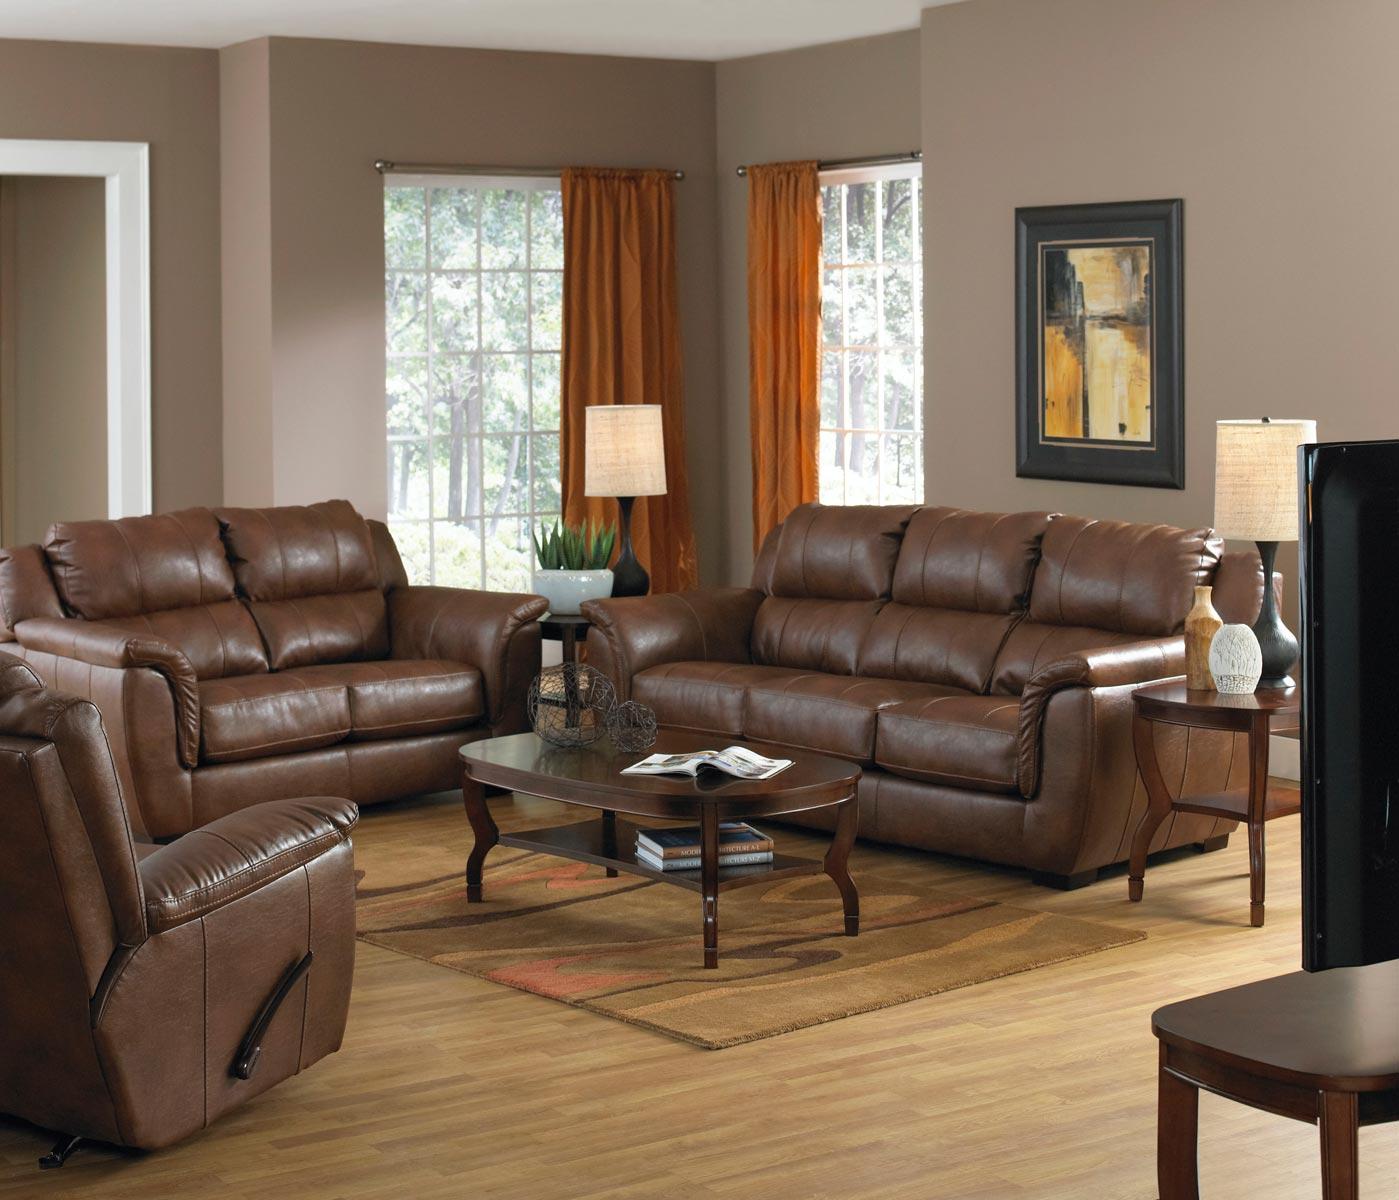 Jackson Verona Leather Sofa Set Chestnut Jf 4490 1223 09 Set  # Muebles Seys Verona